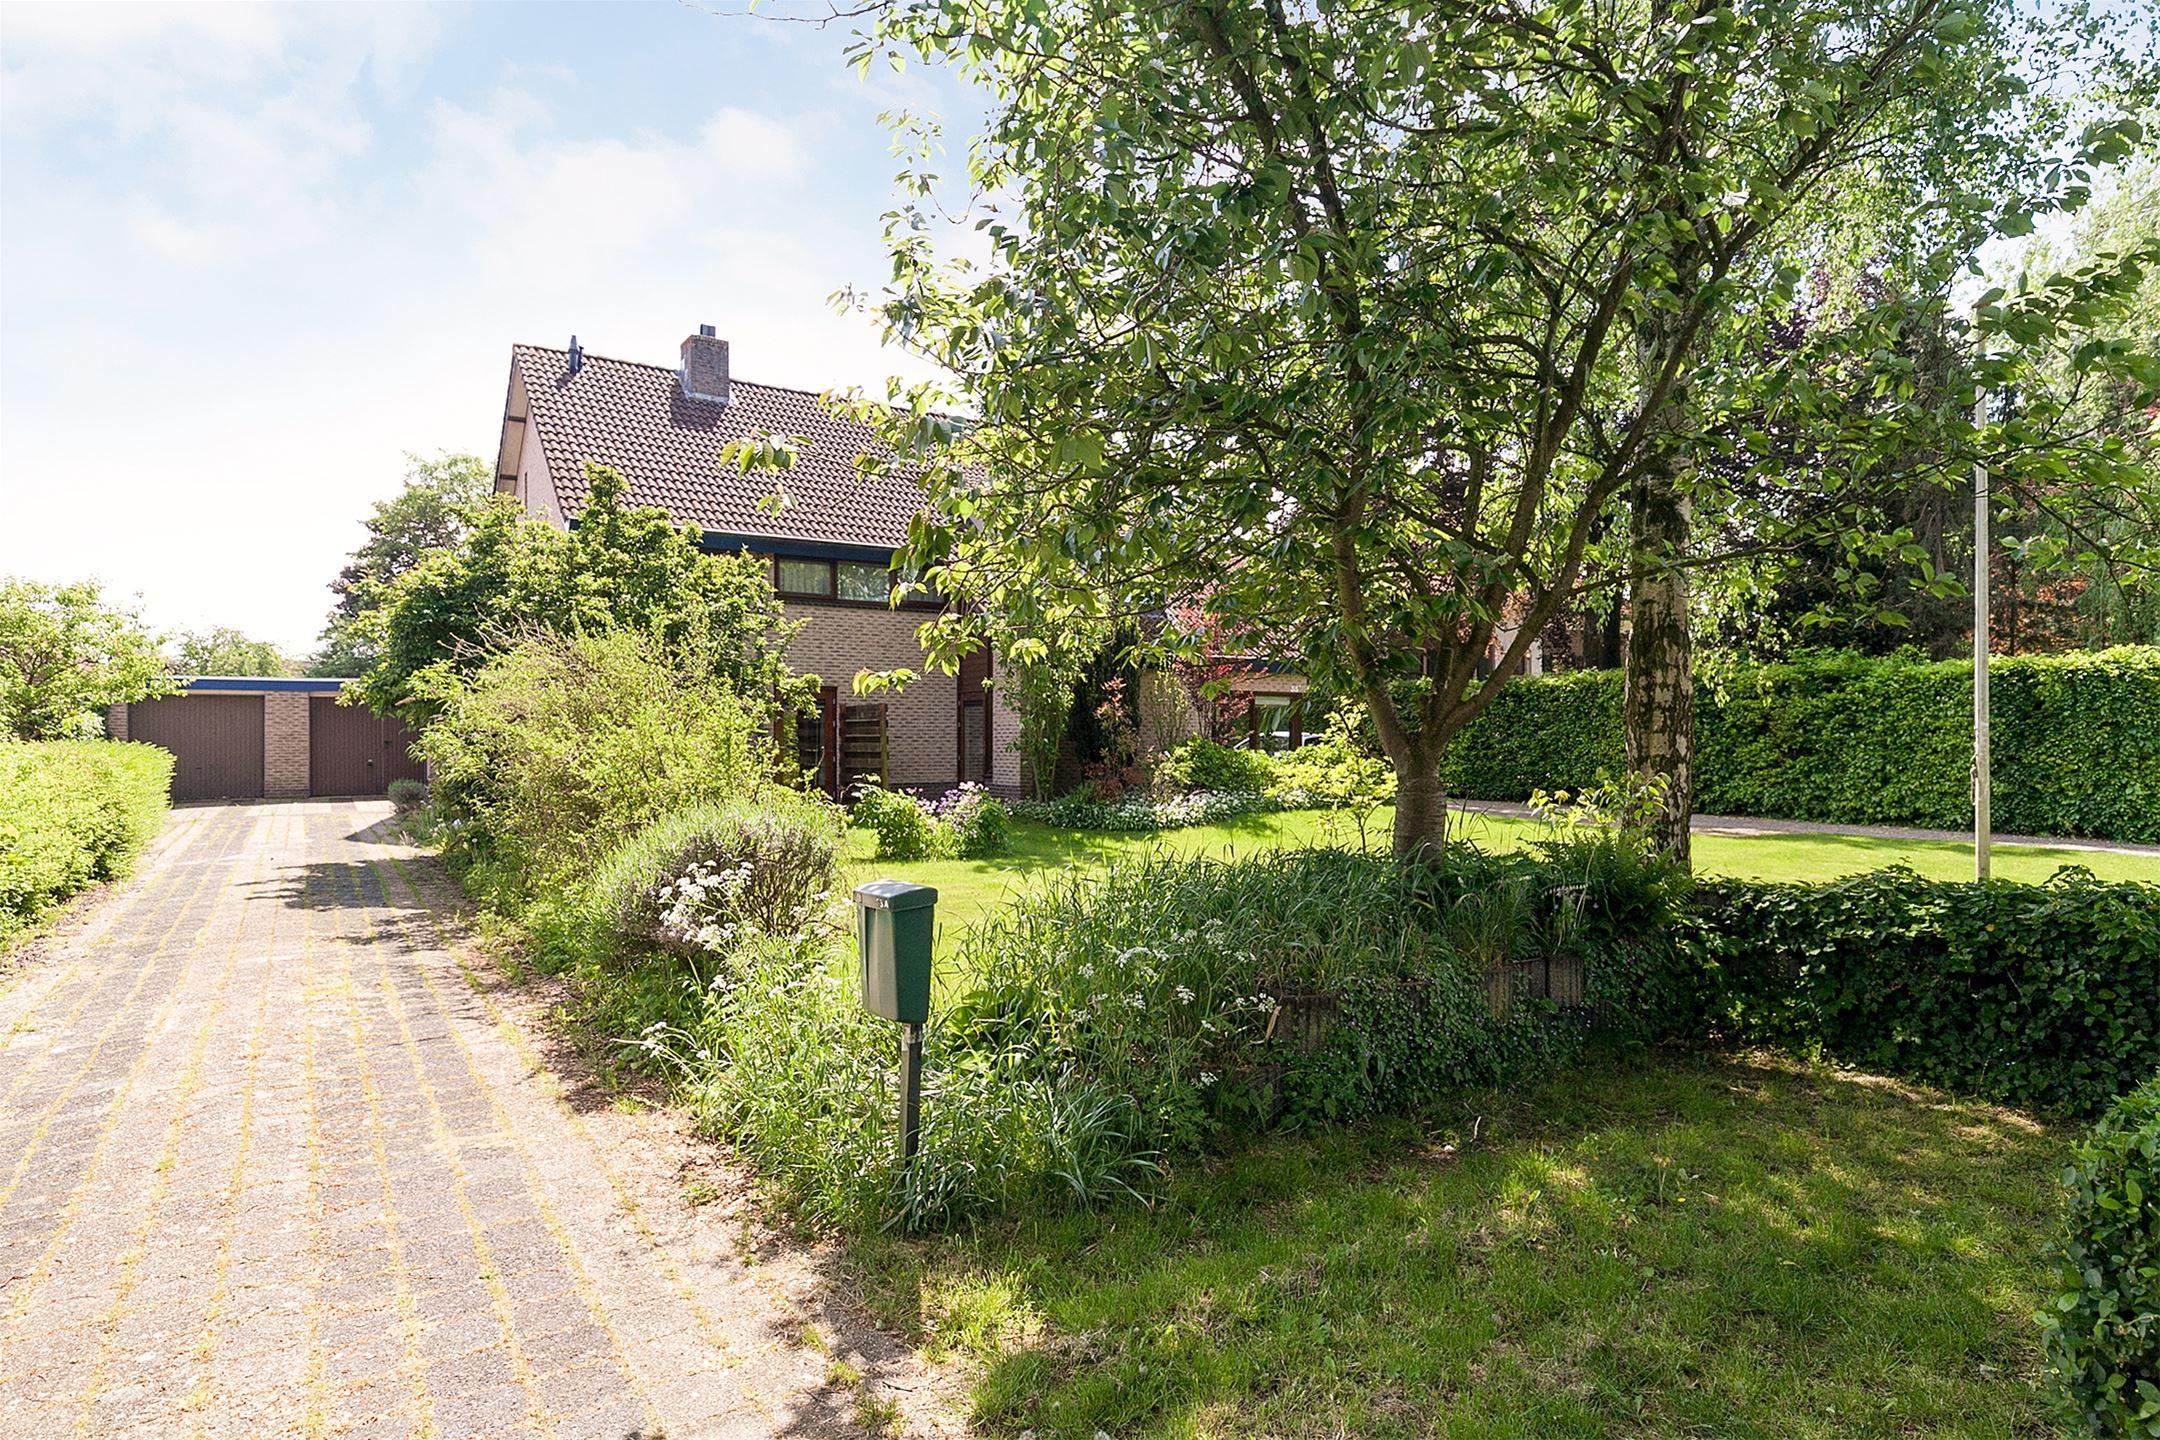 Verkocht Veldstraat 35 A 6671 Bw Zetten Funda